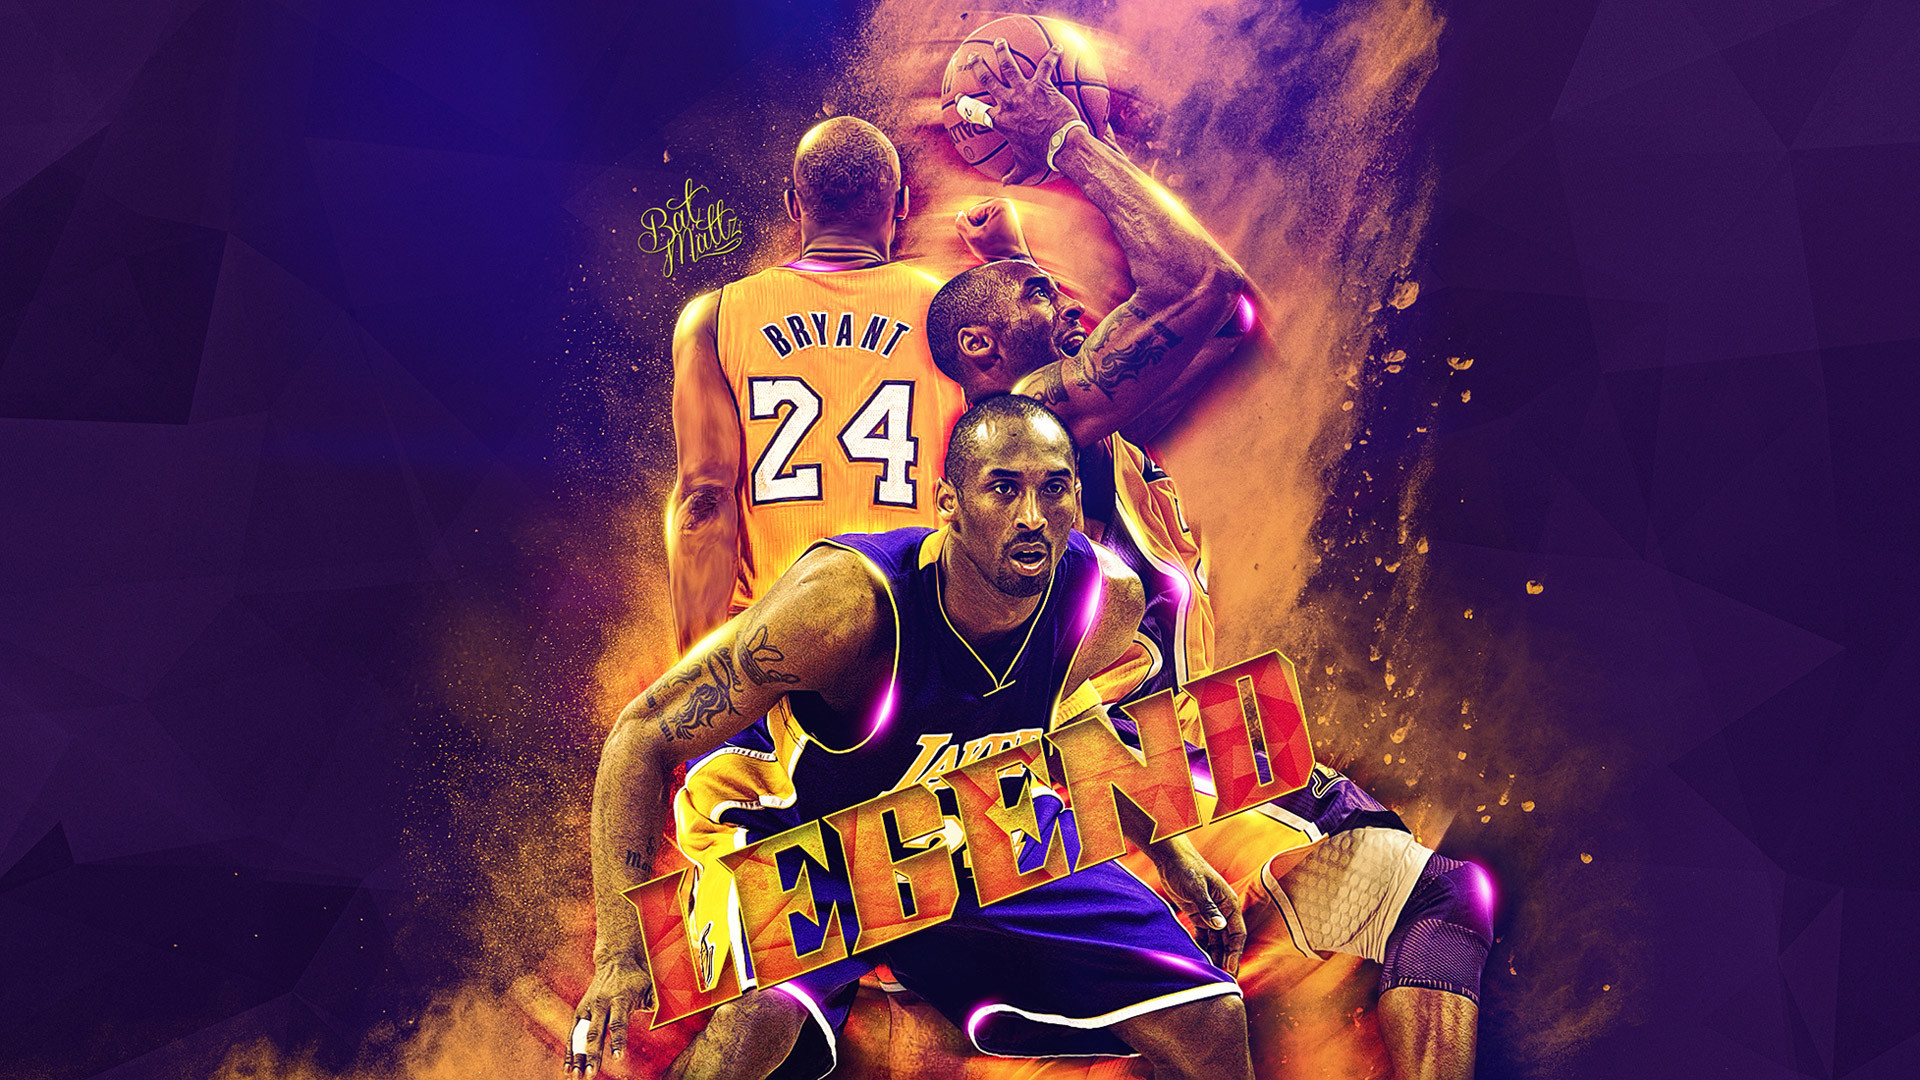 Kobe Bryant NBA Legend Wallpaper